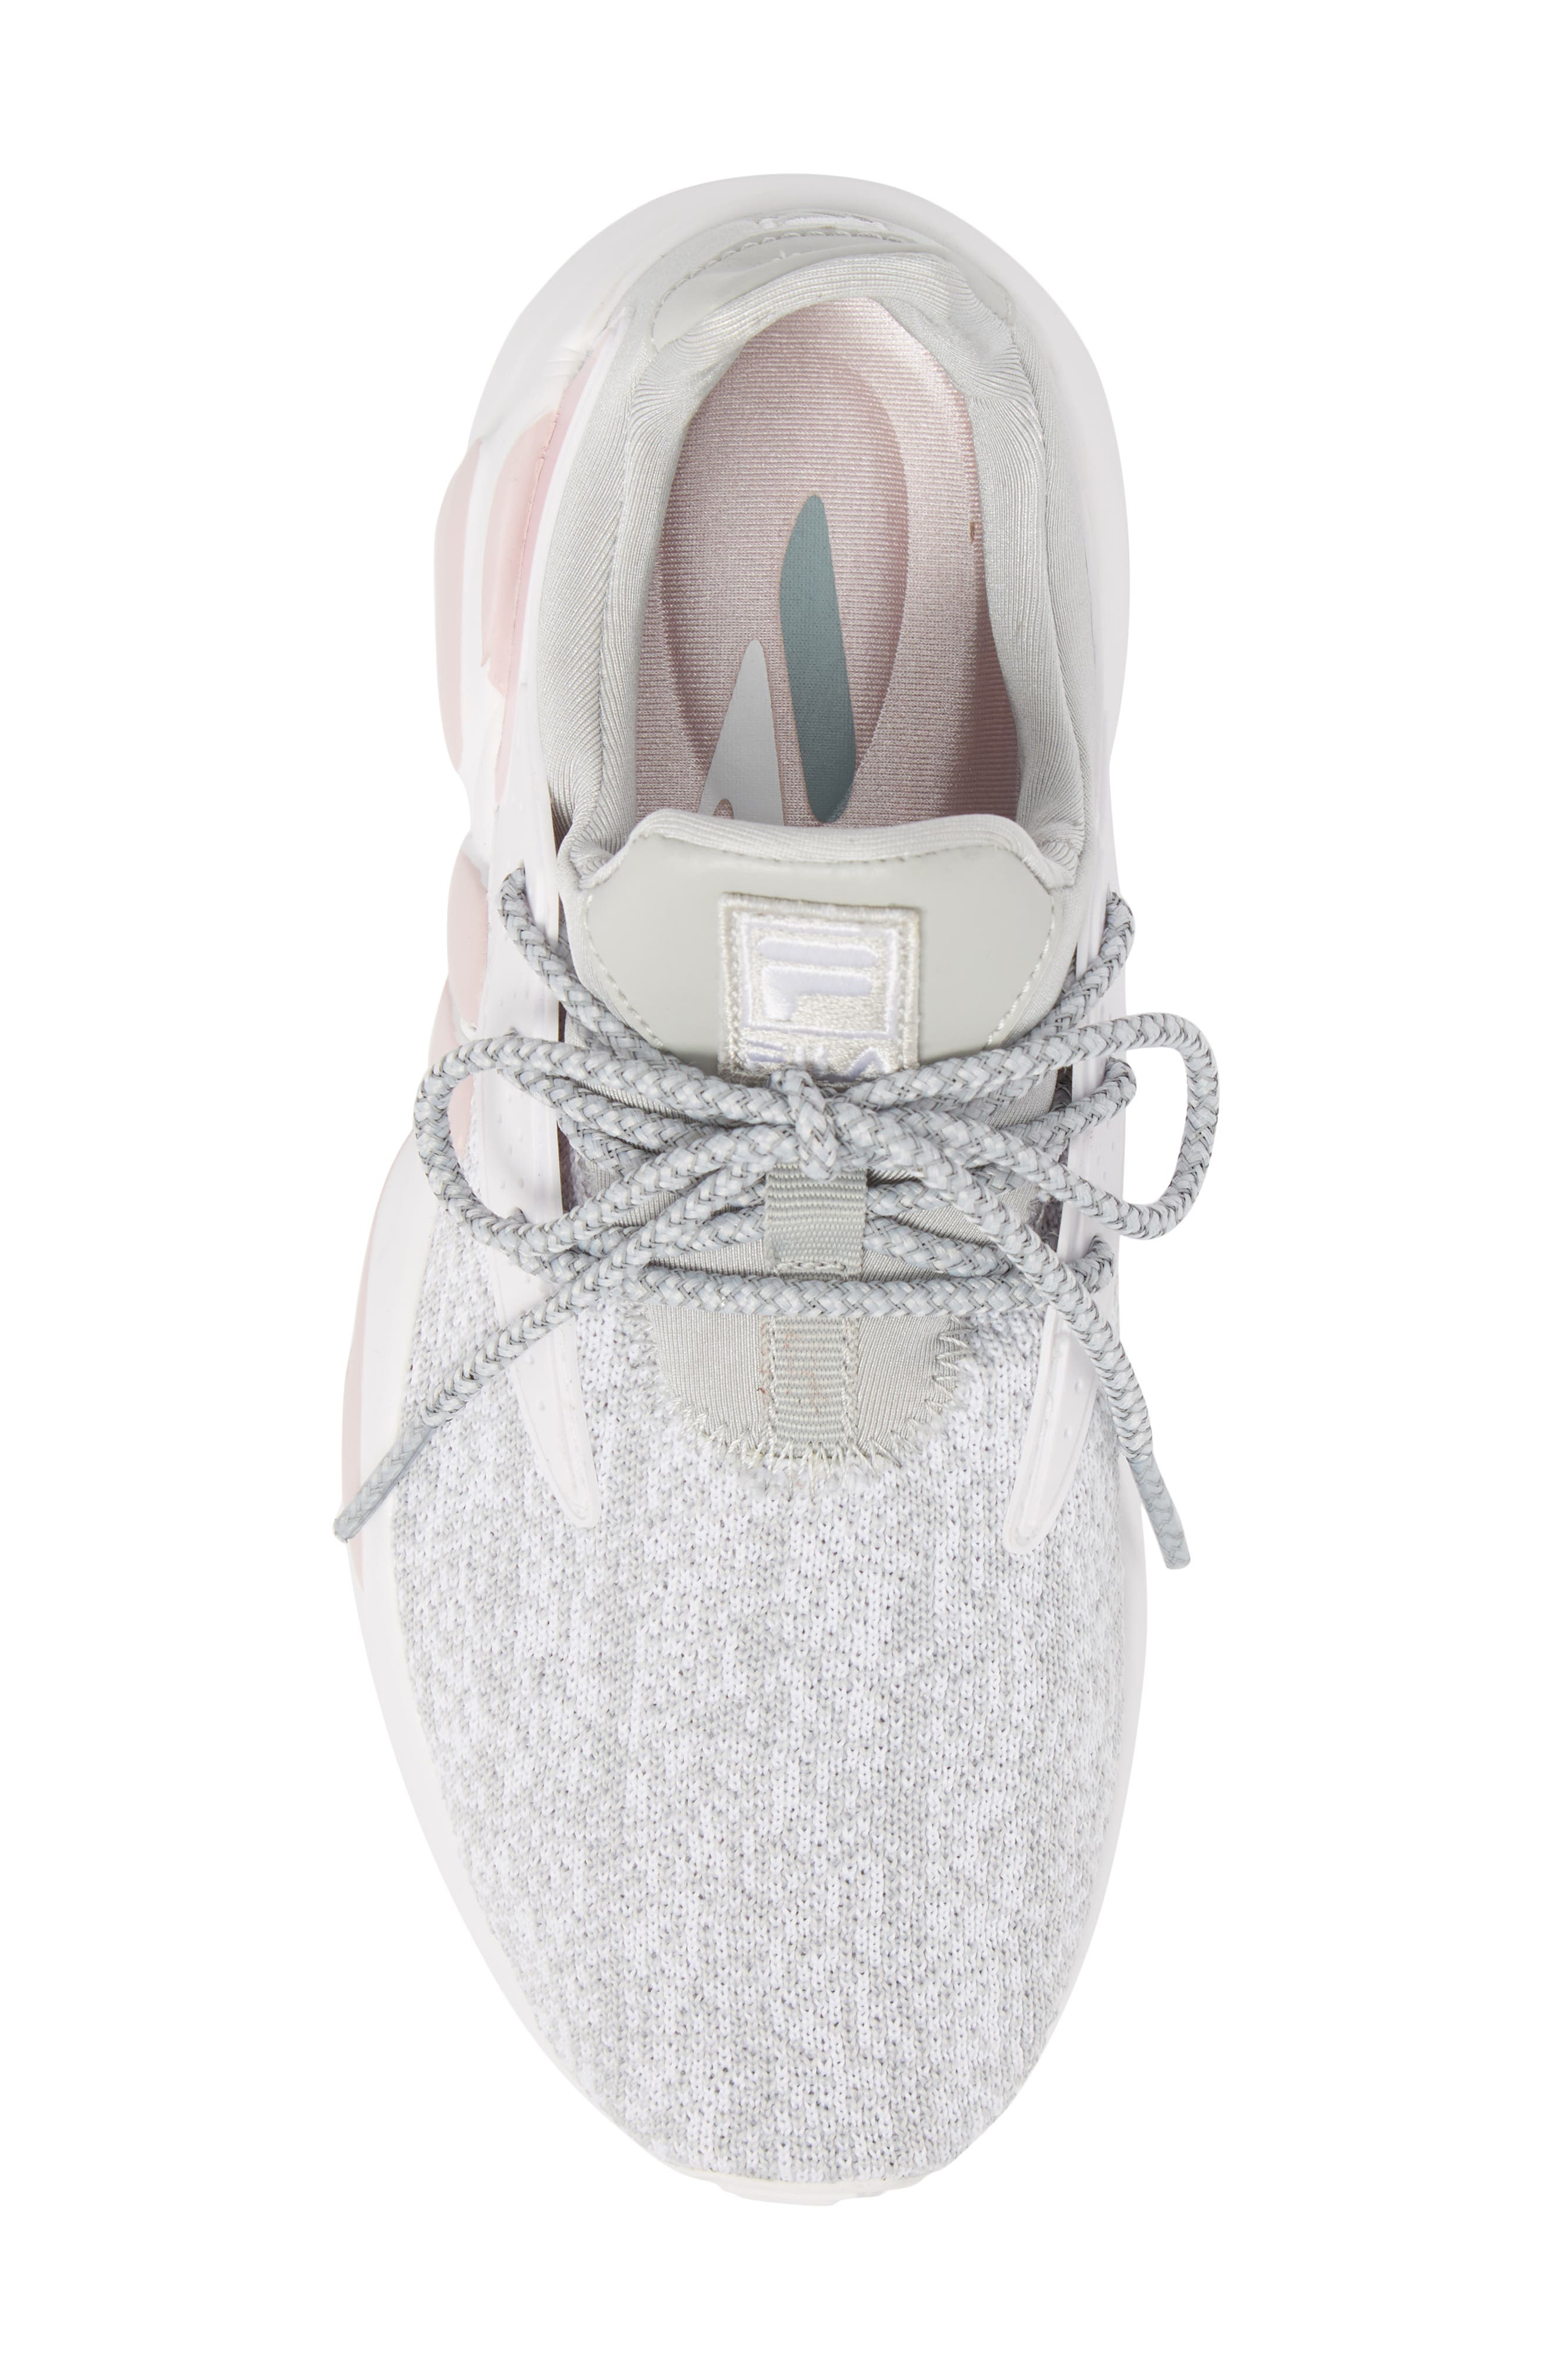 Mindbreaker 2.0 Sneaker,                             Alternate thumbnail 5, color,                             HIGHRISE/ WHITE/ CHALK PINK